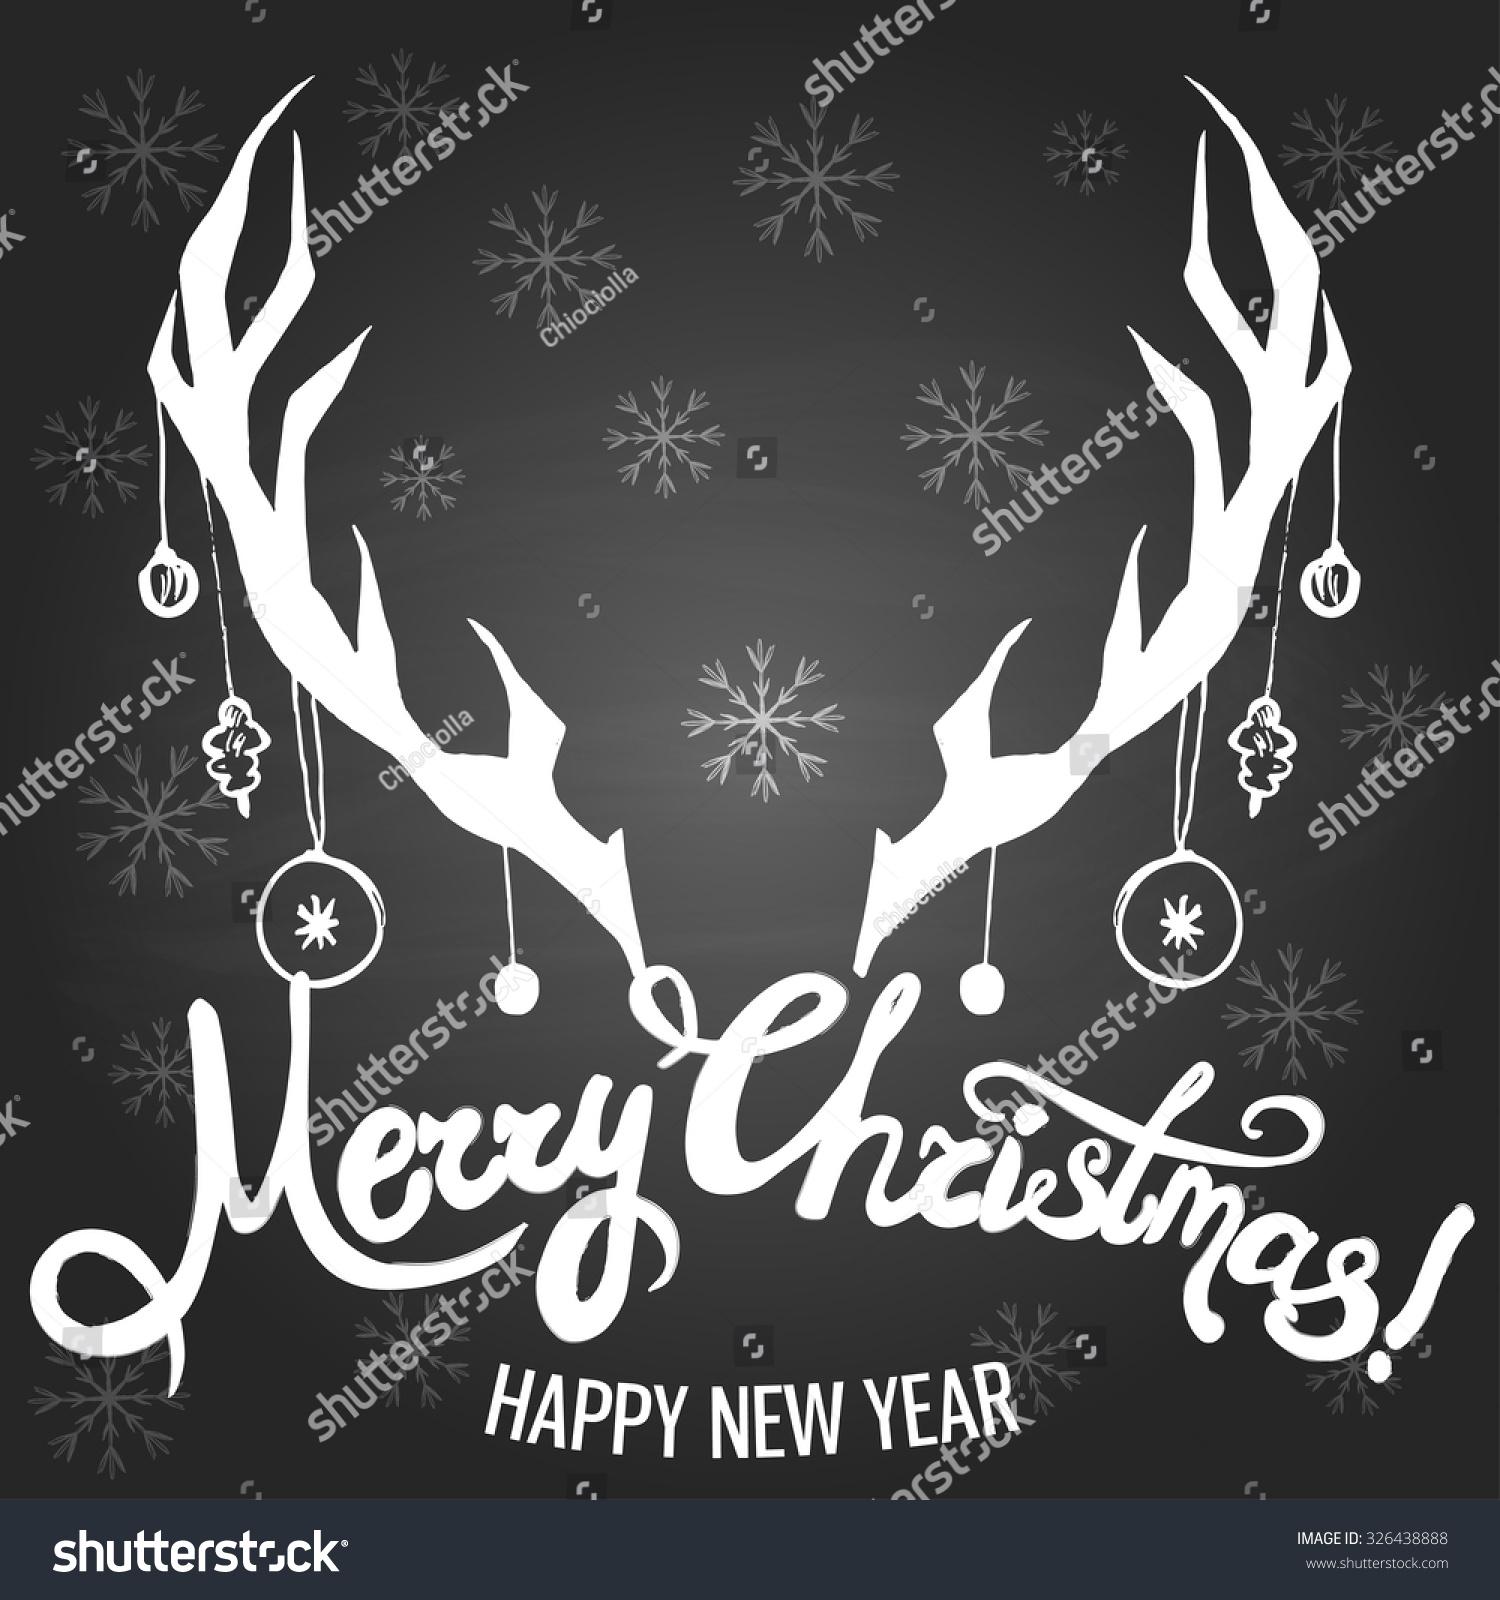 Christmas Template Deer Horns Silhouette Snowflakes Stock Vector